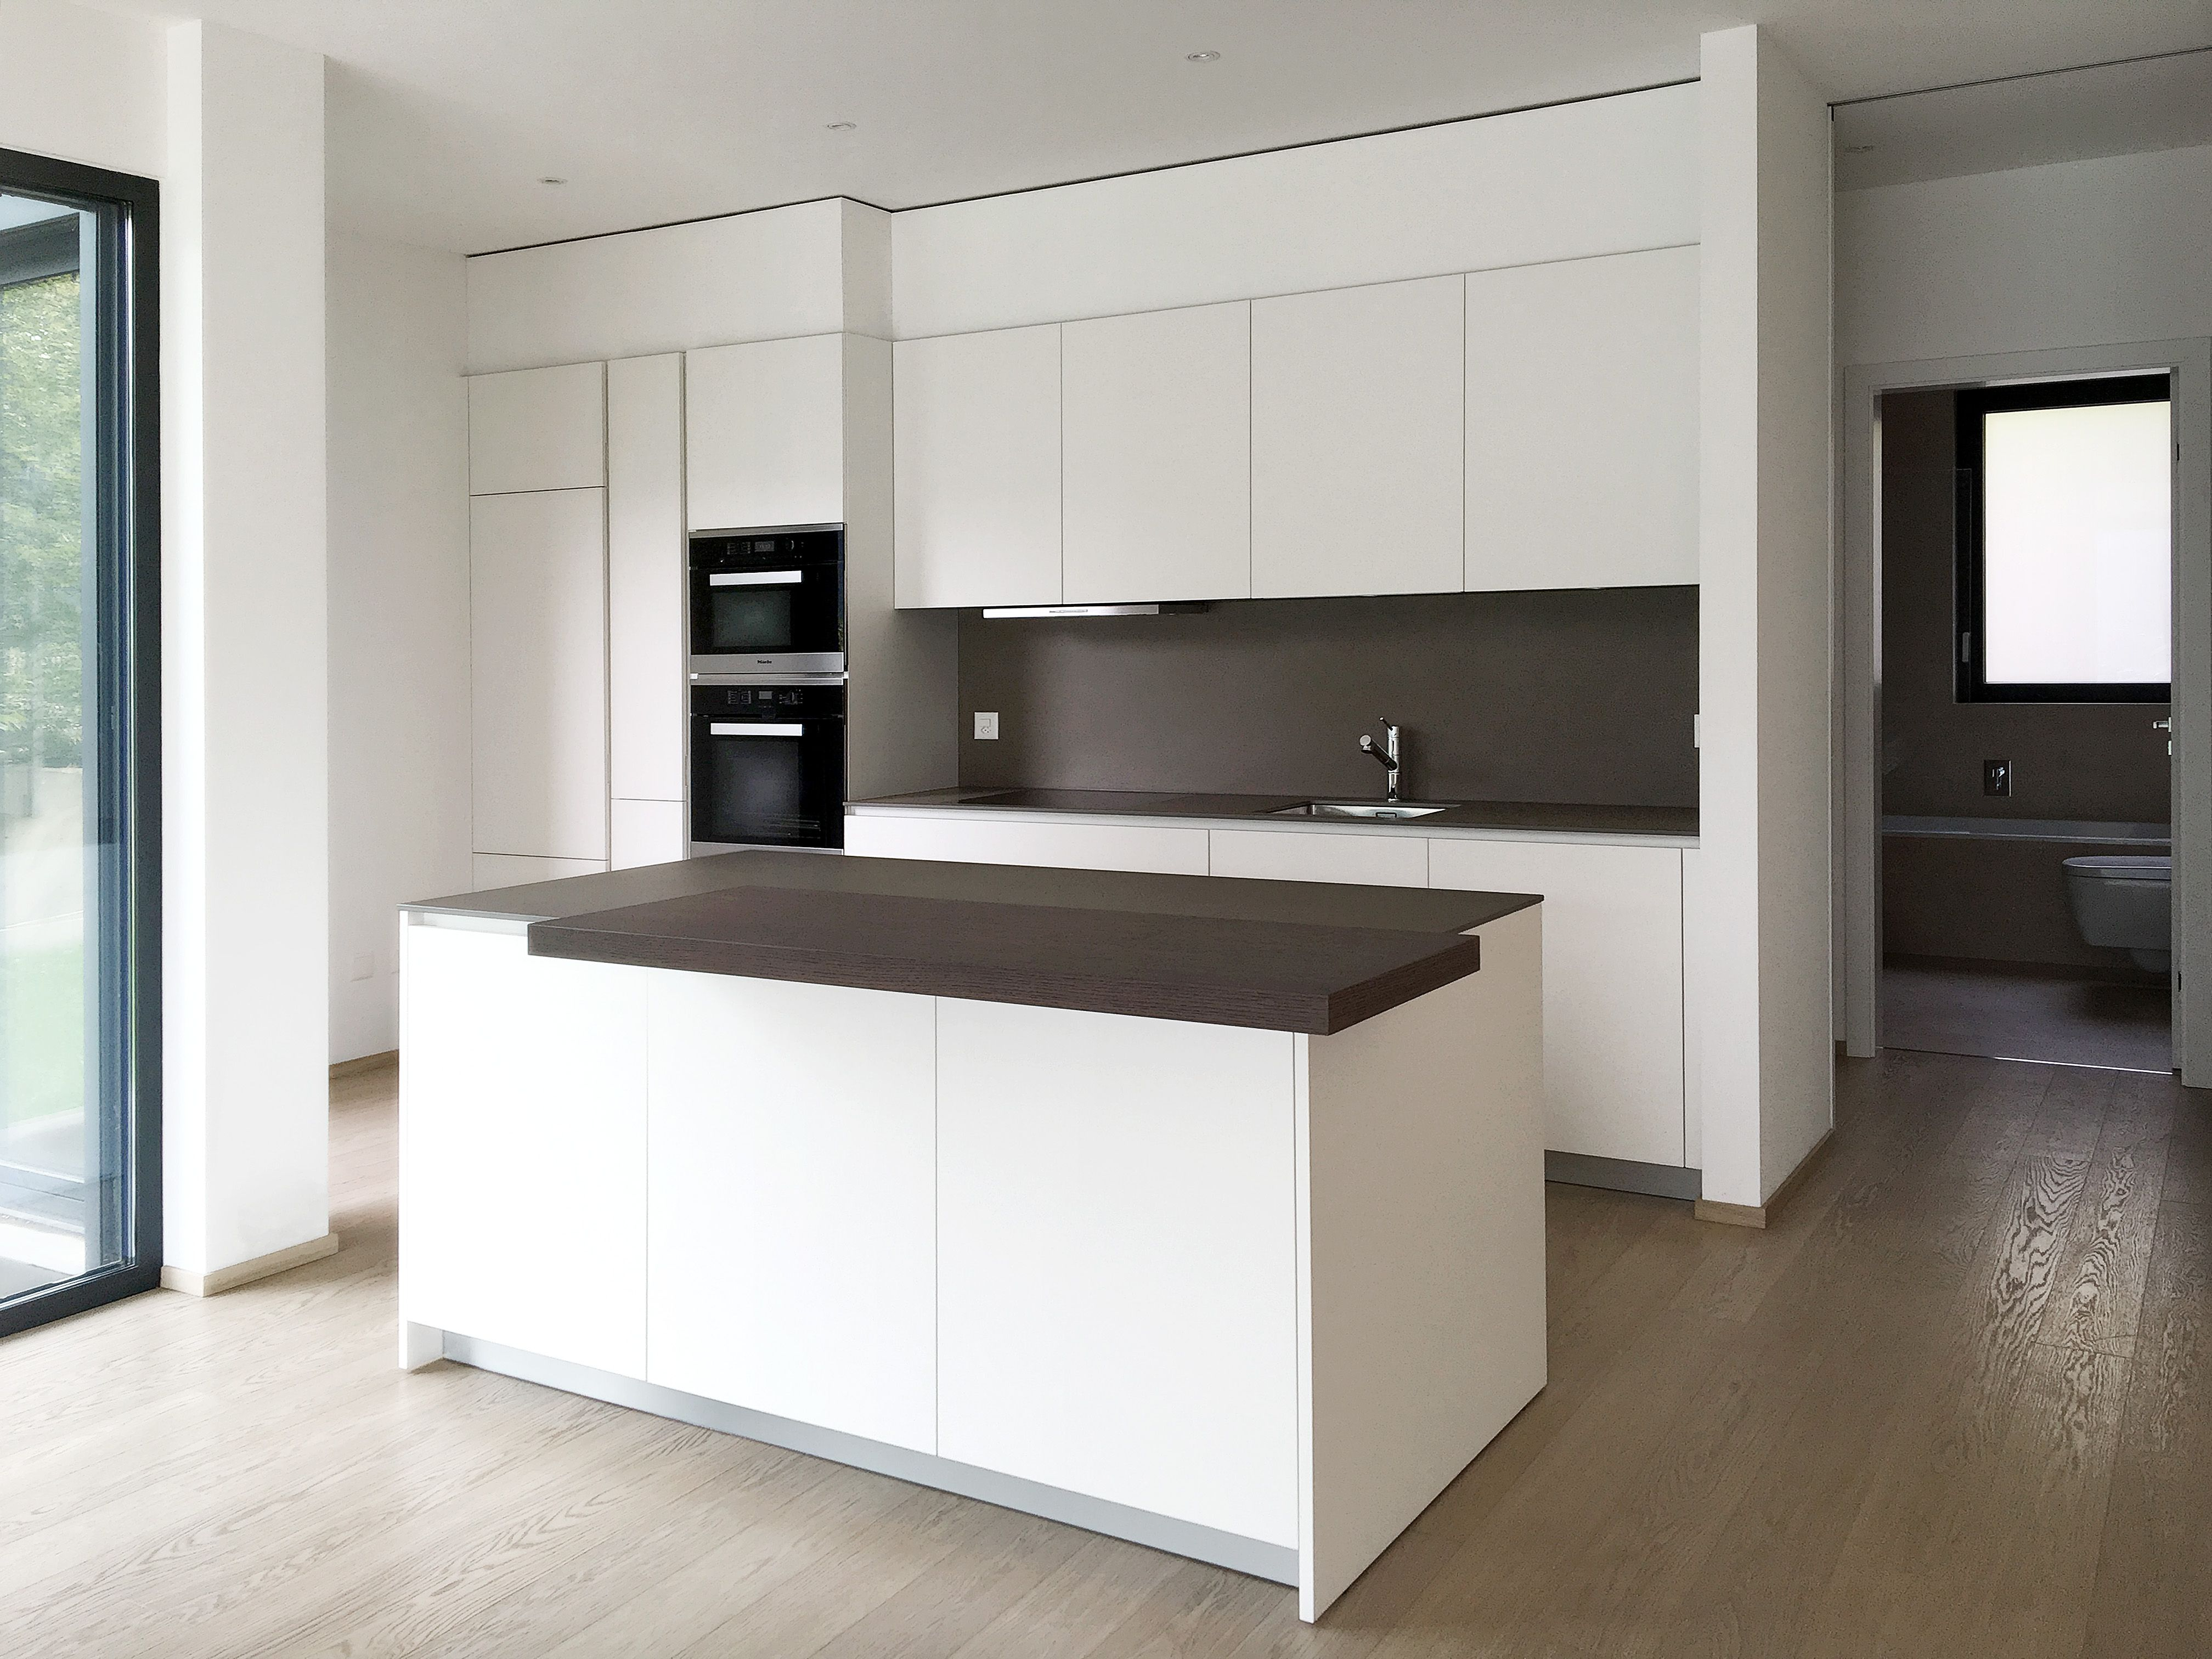 cucina design varenna poliform laccata bianca con piano in ... - Ceramica Cucina